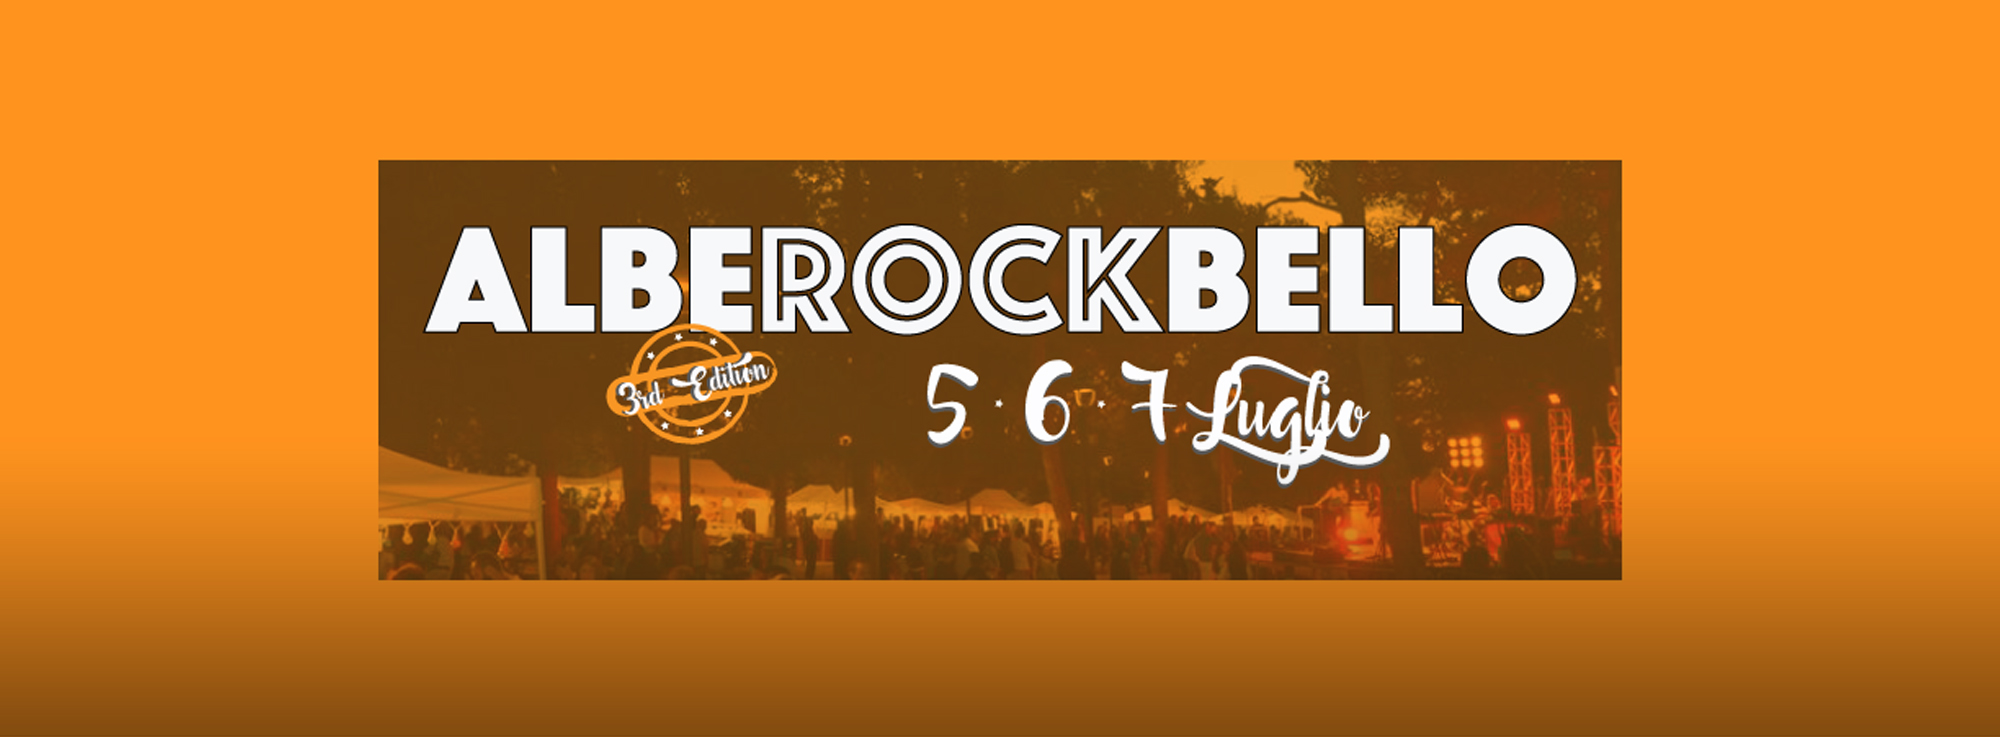 Alberobello: Alberockbello